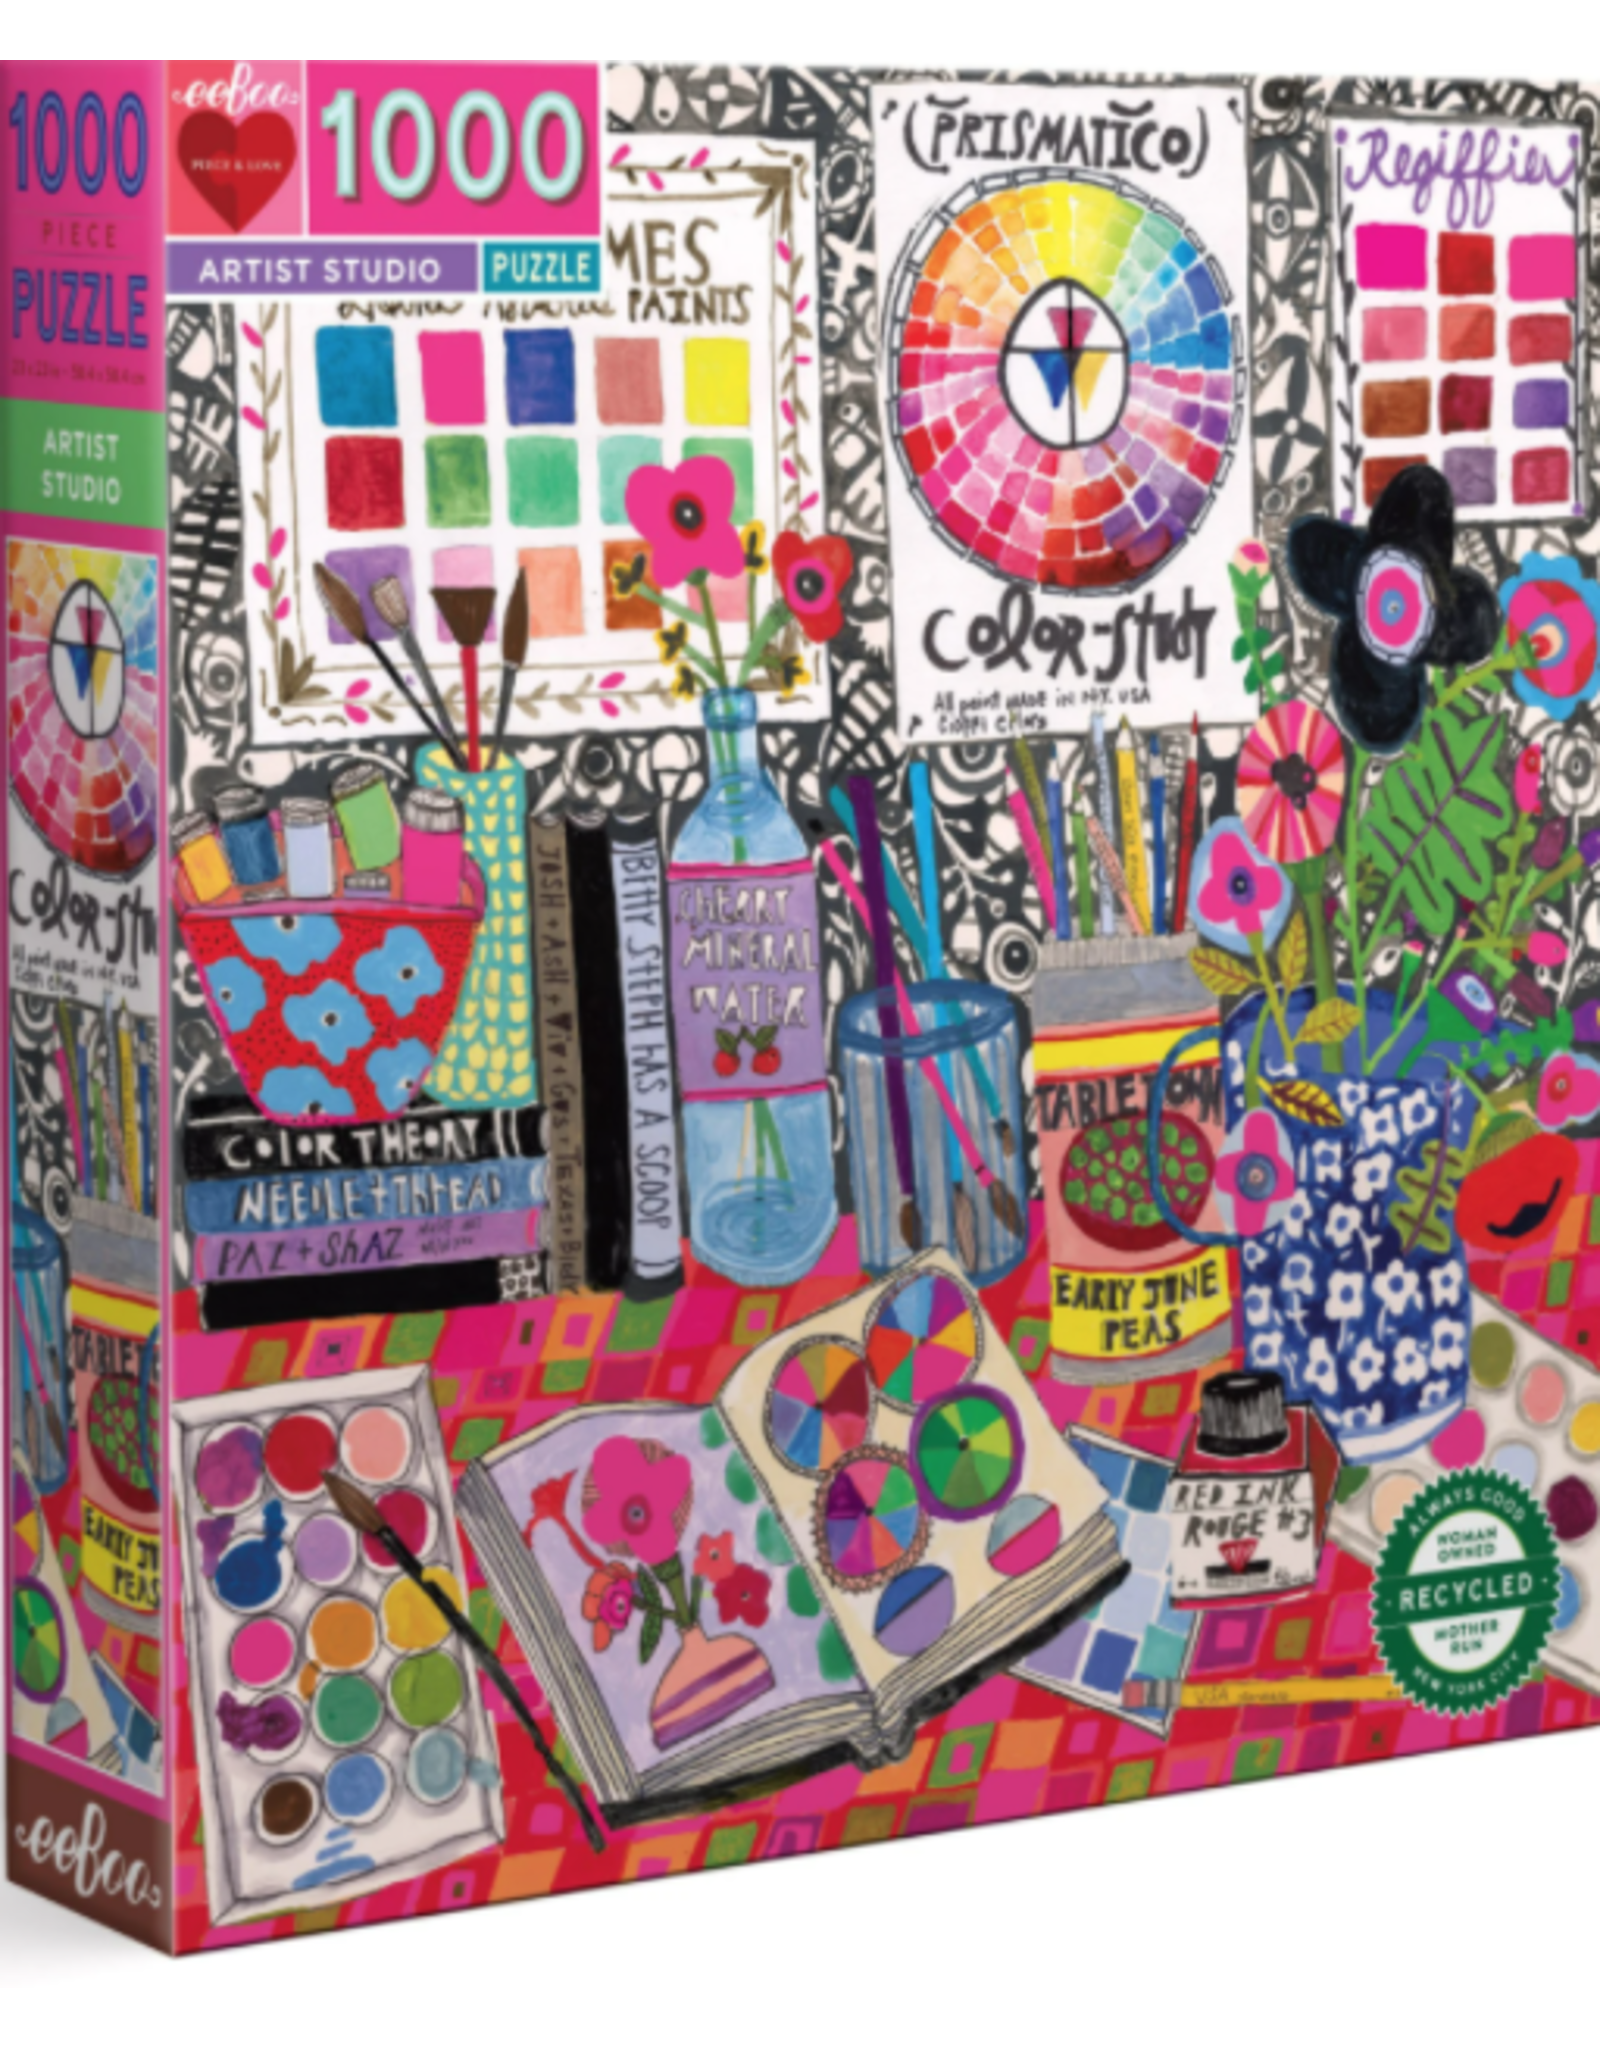 Eeboo 1000 pcs Artist Studio Puzzle